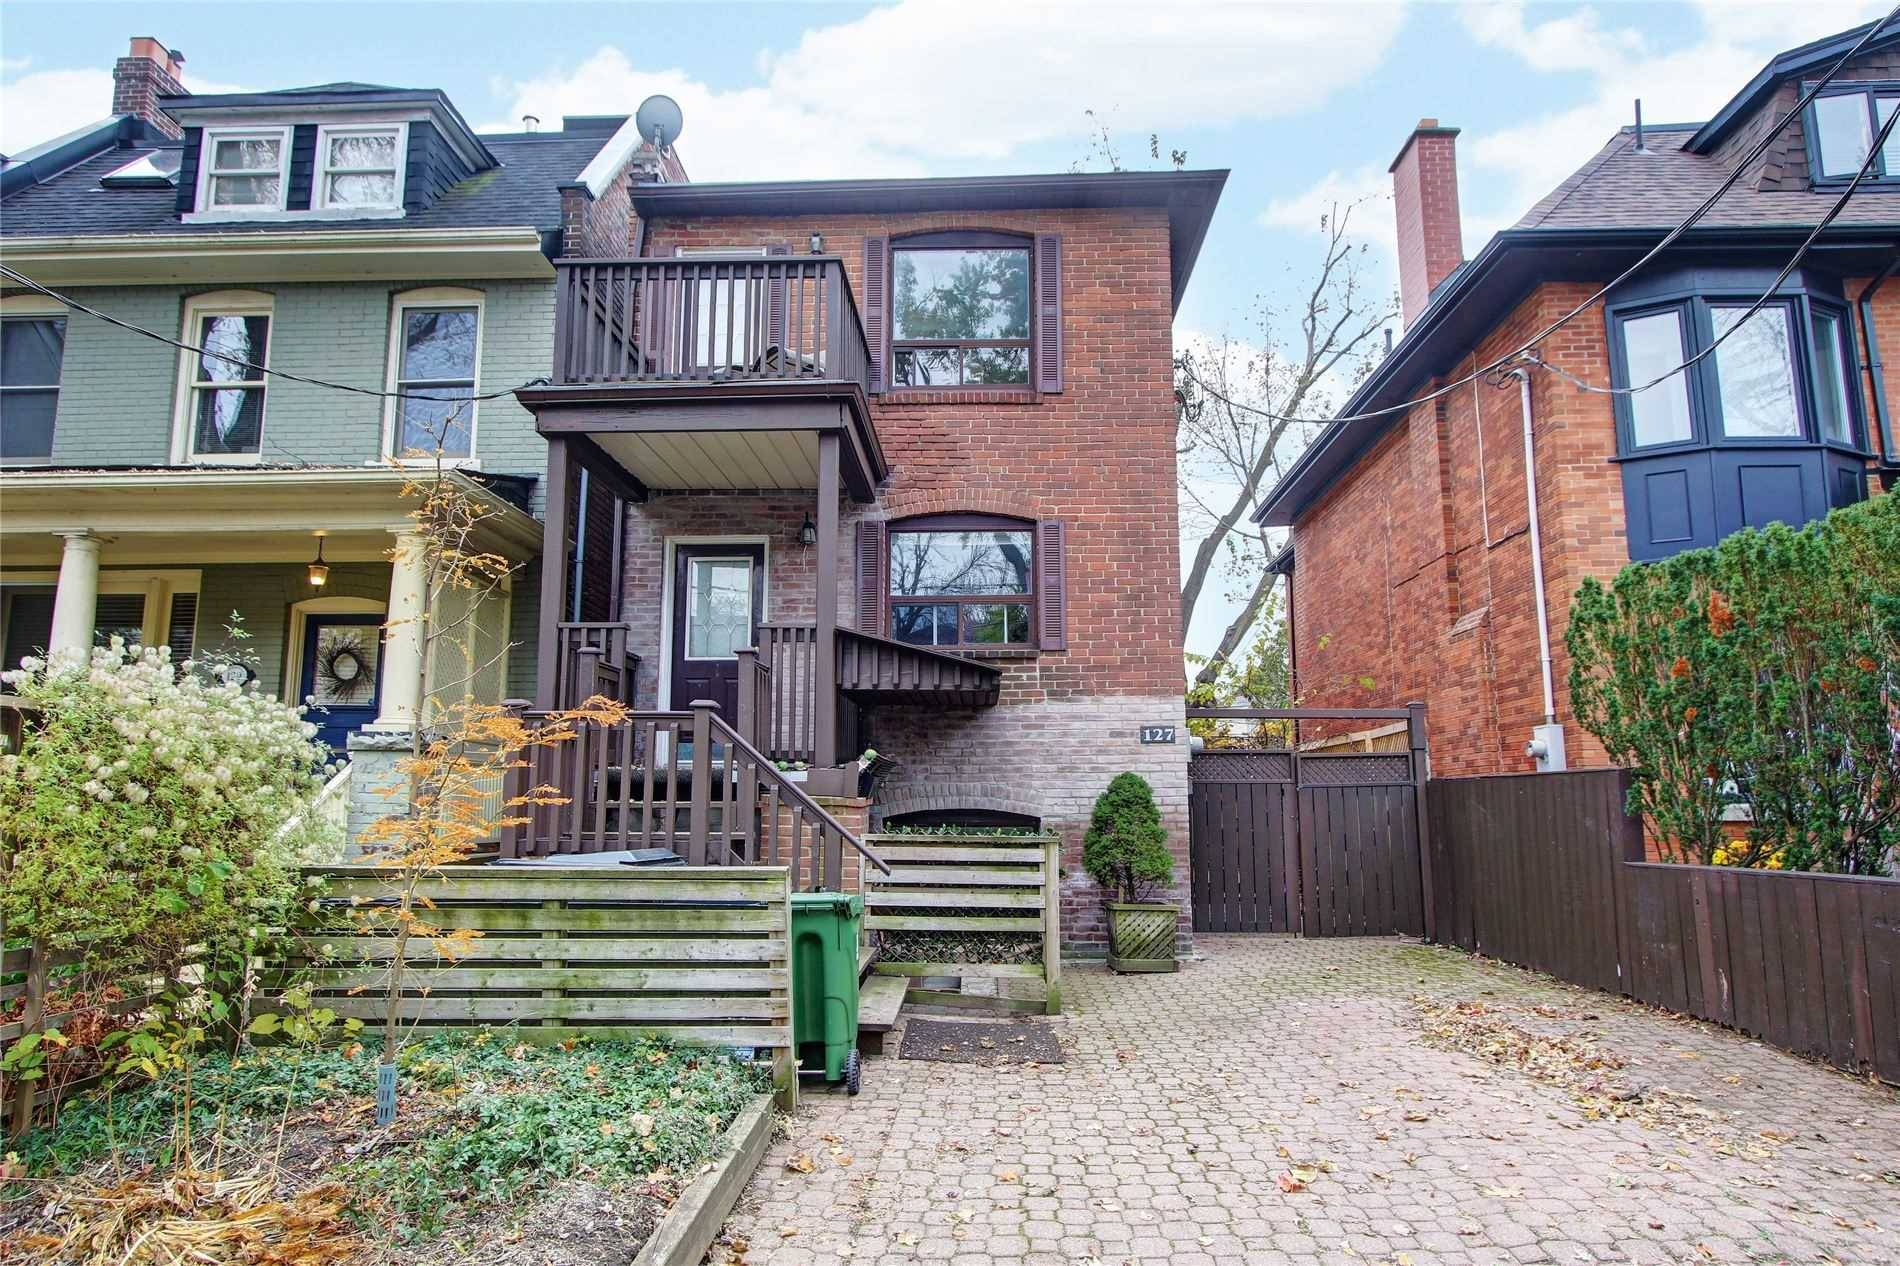 Buliding: 127 Summerhill Avenue, Toronto, ON